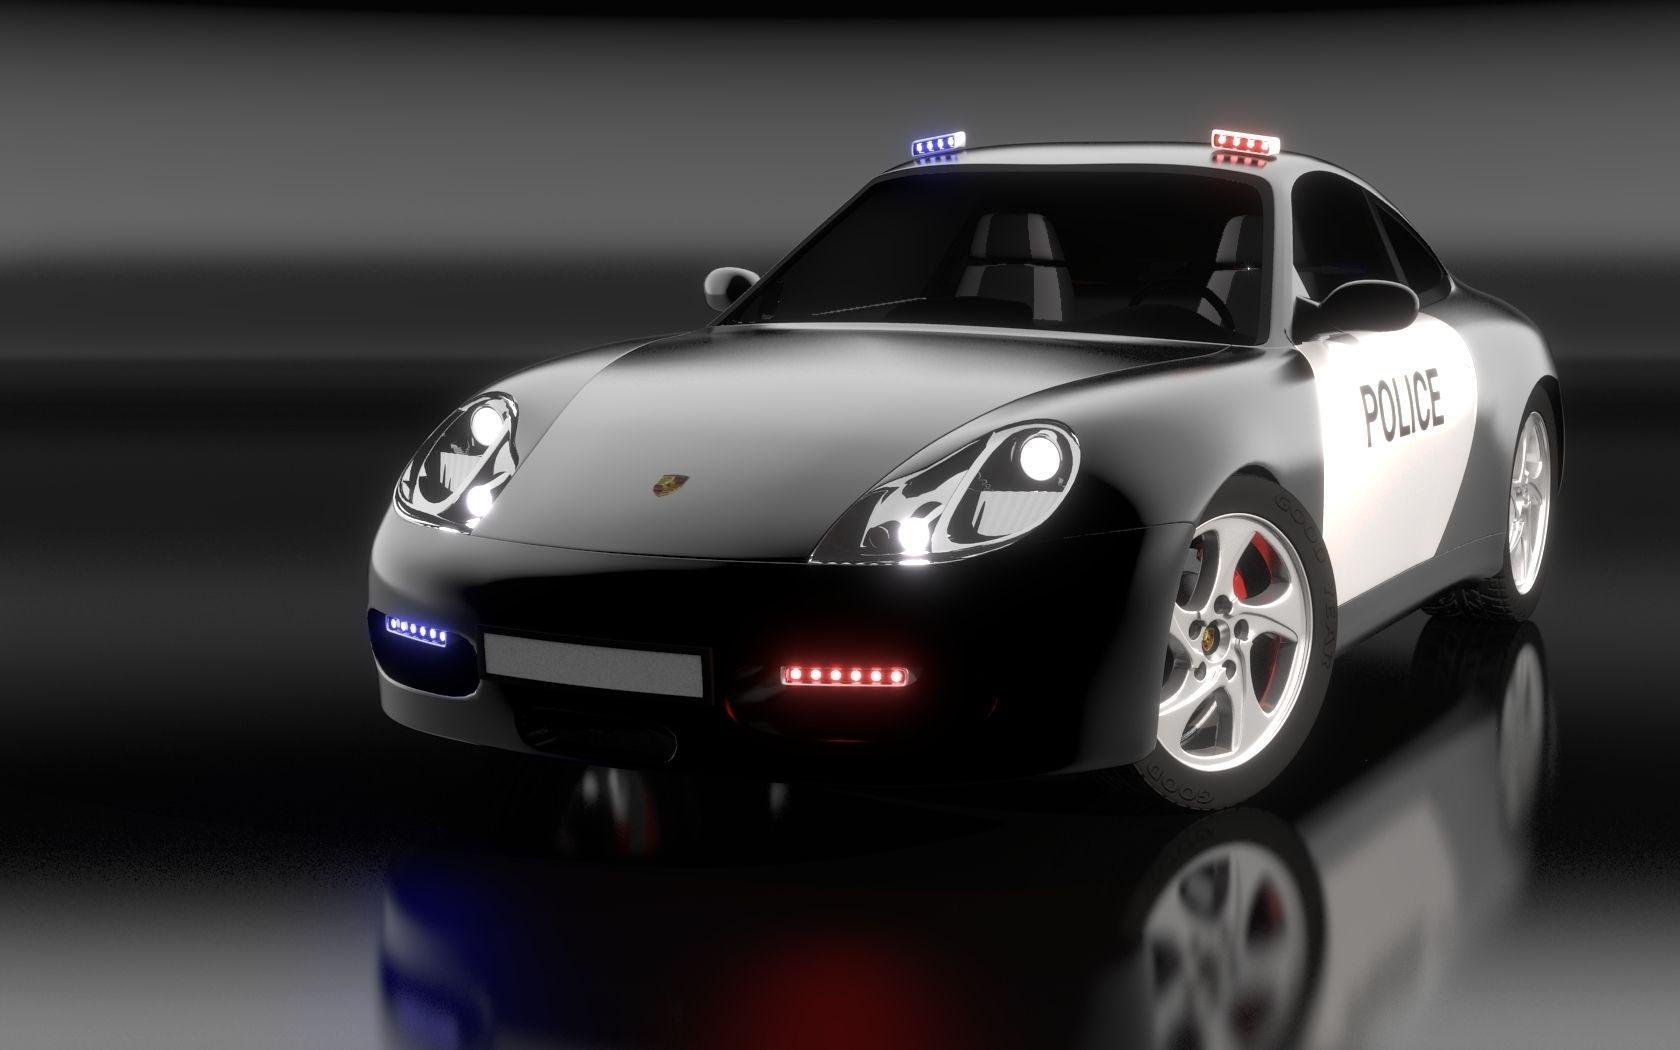 Porsche 911 Carrera S4 Police 3D model